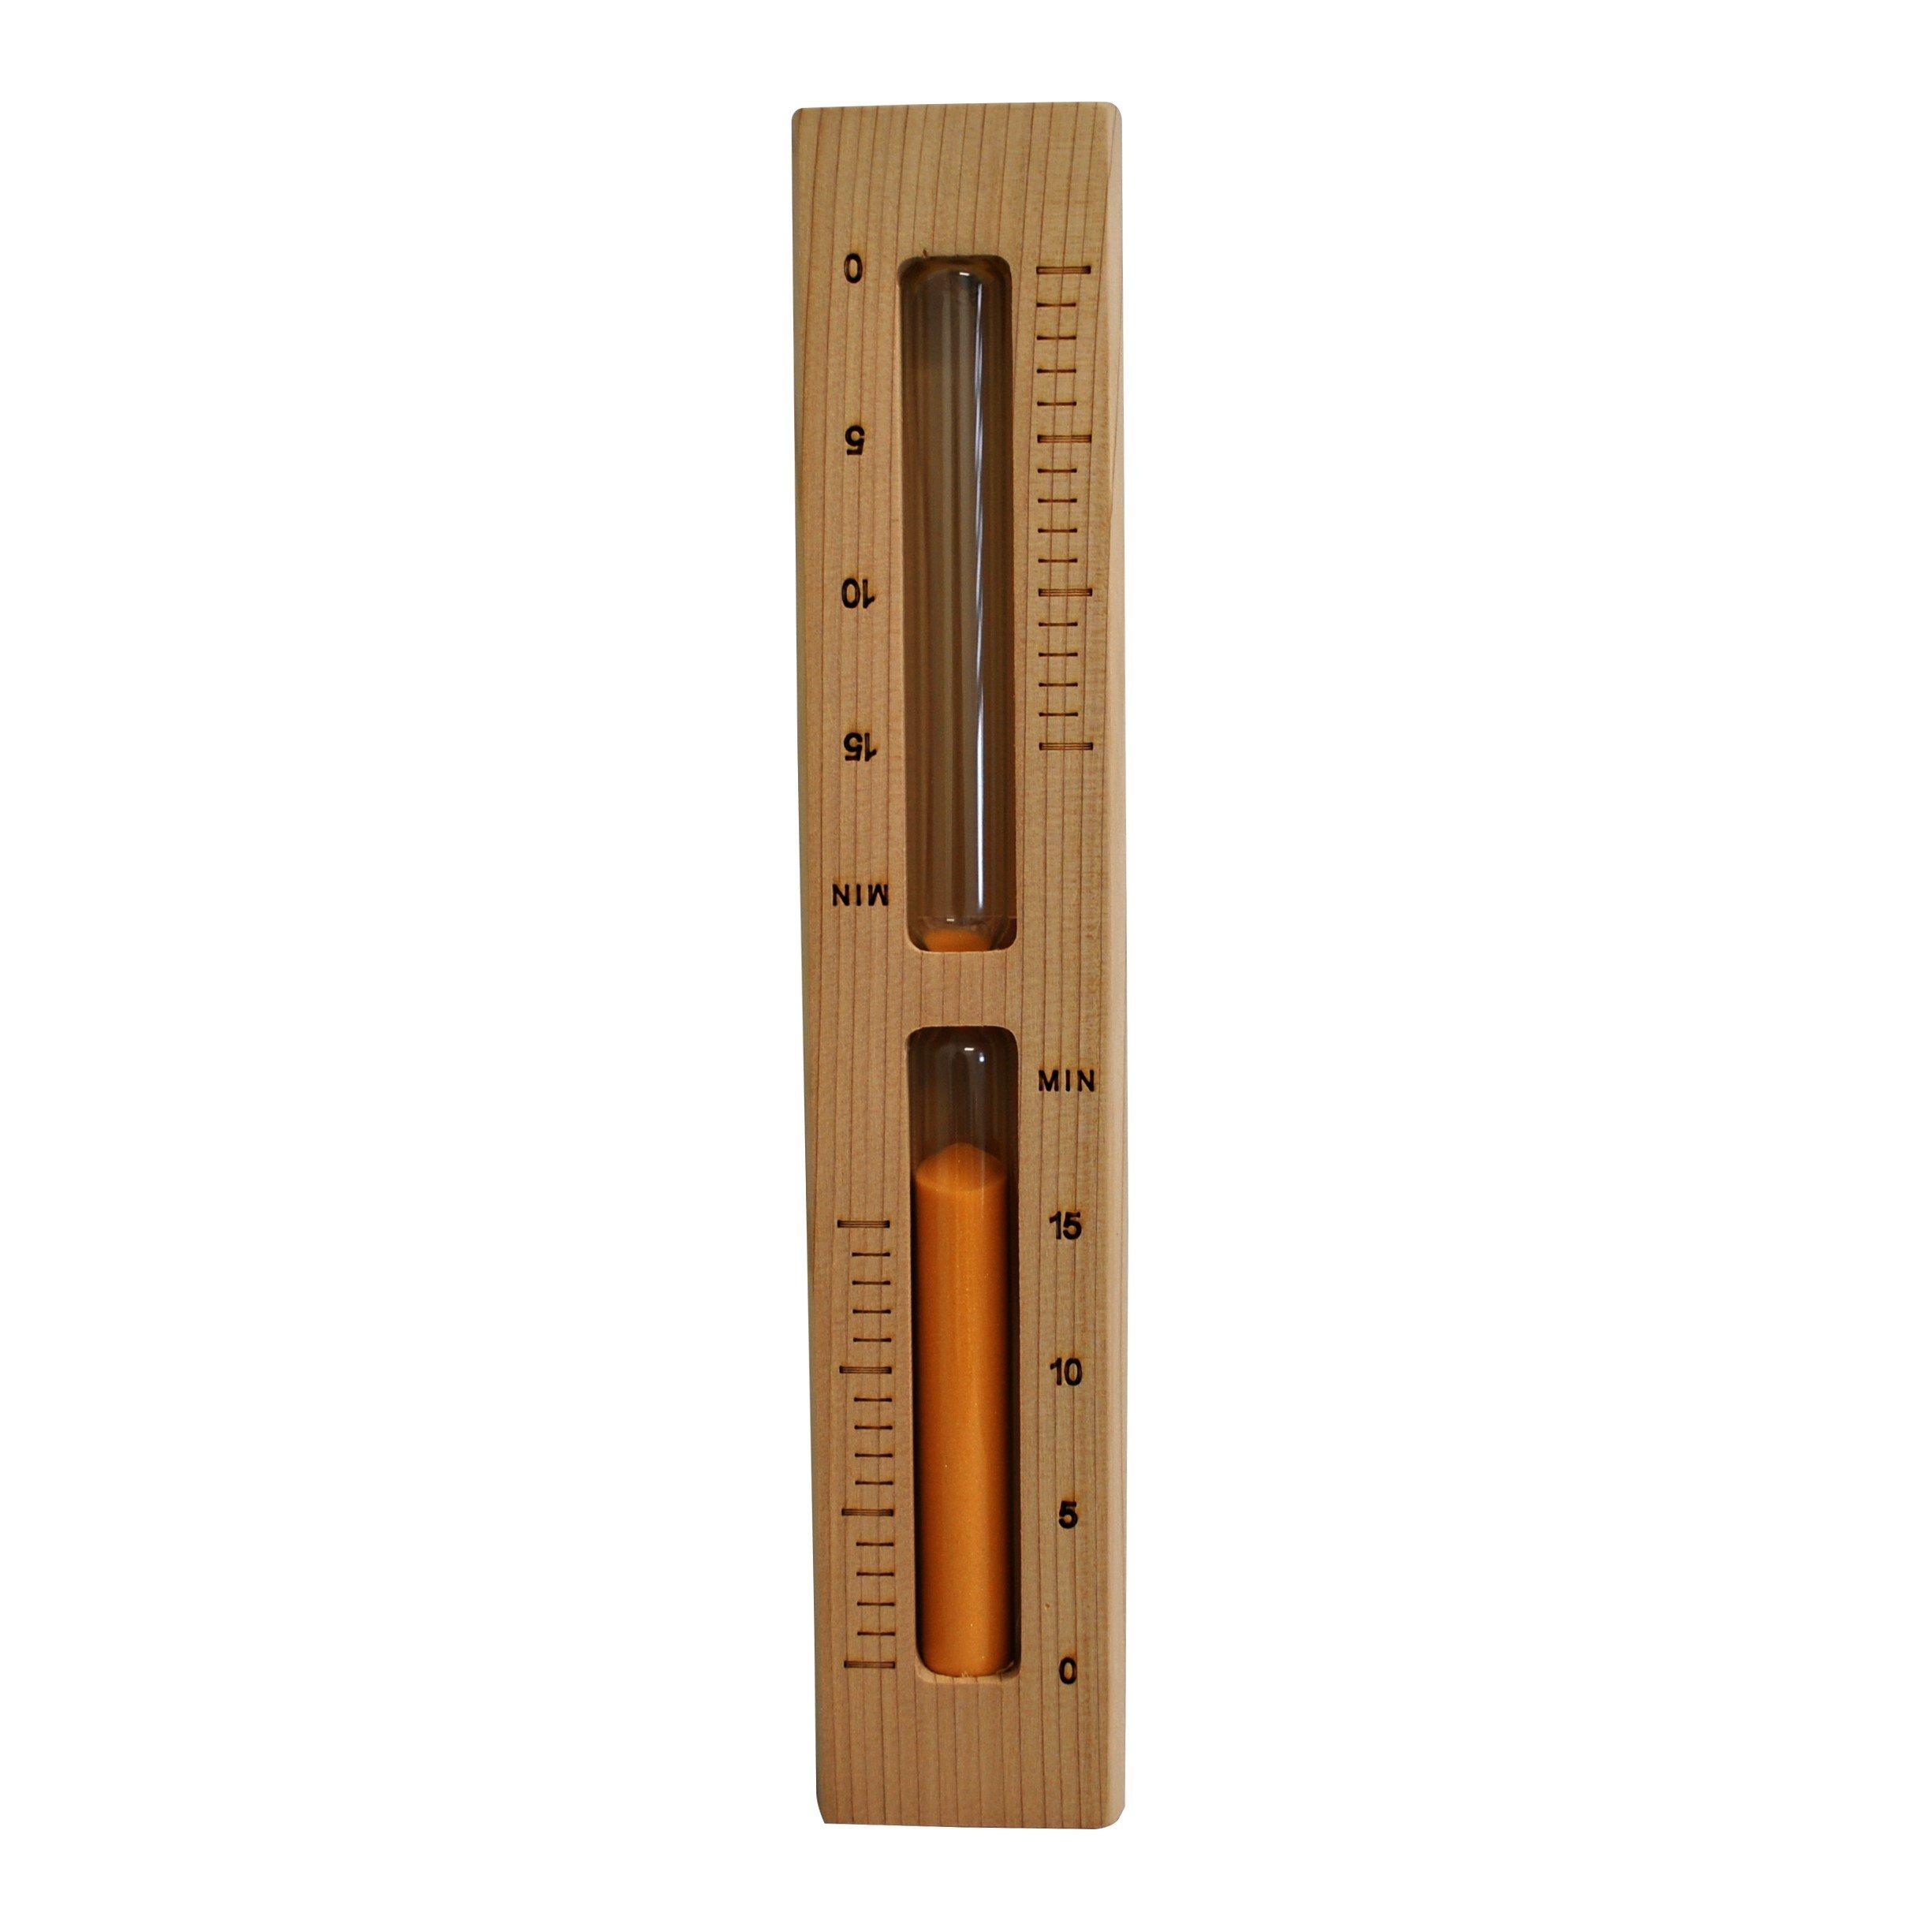 Sauna Hour Glass Timer Cedar